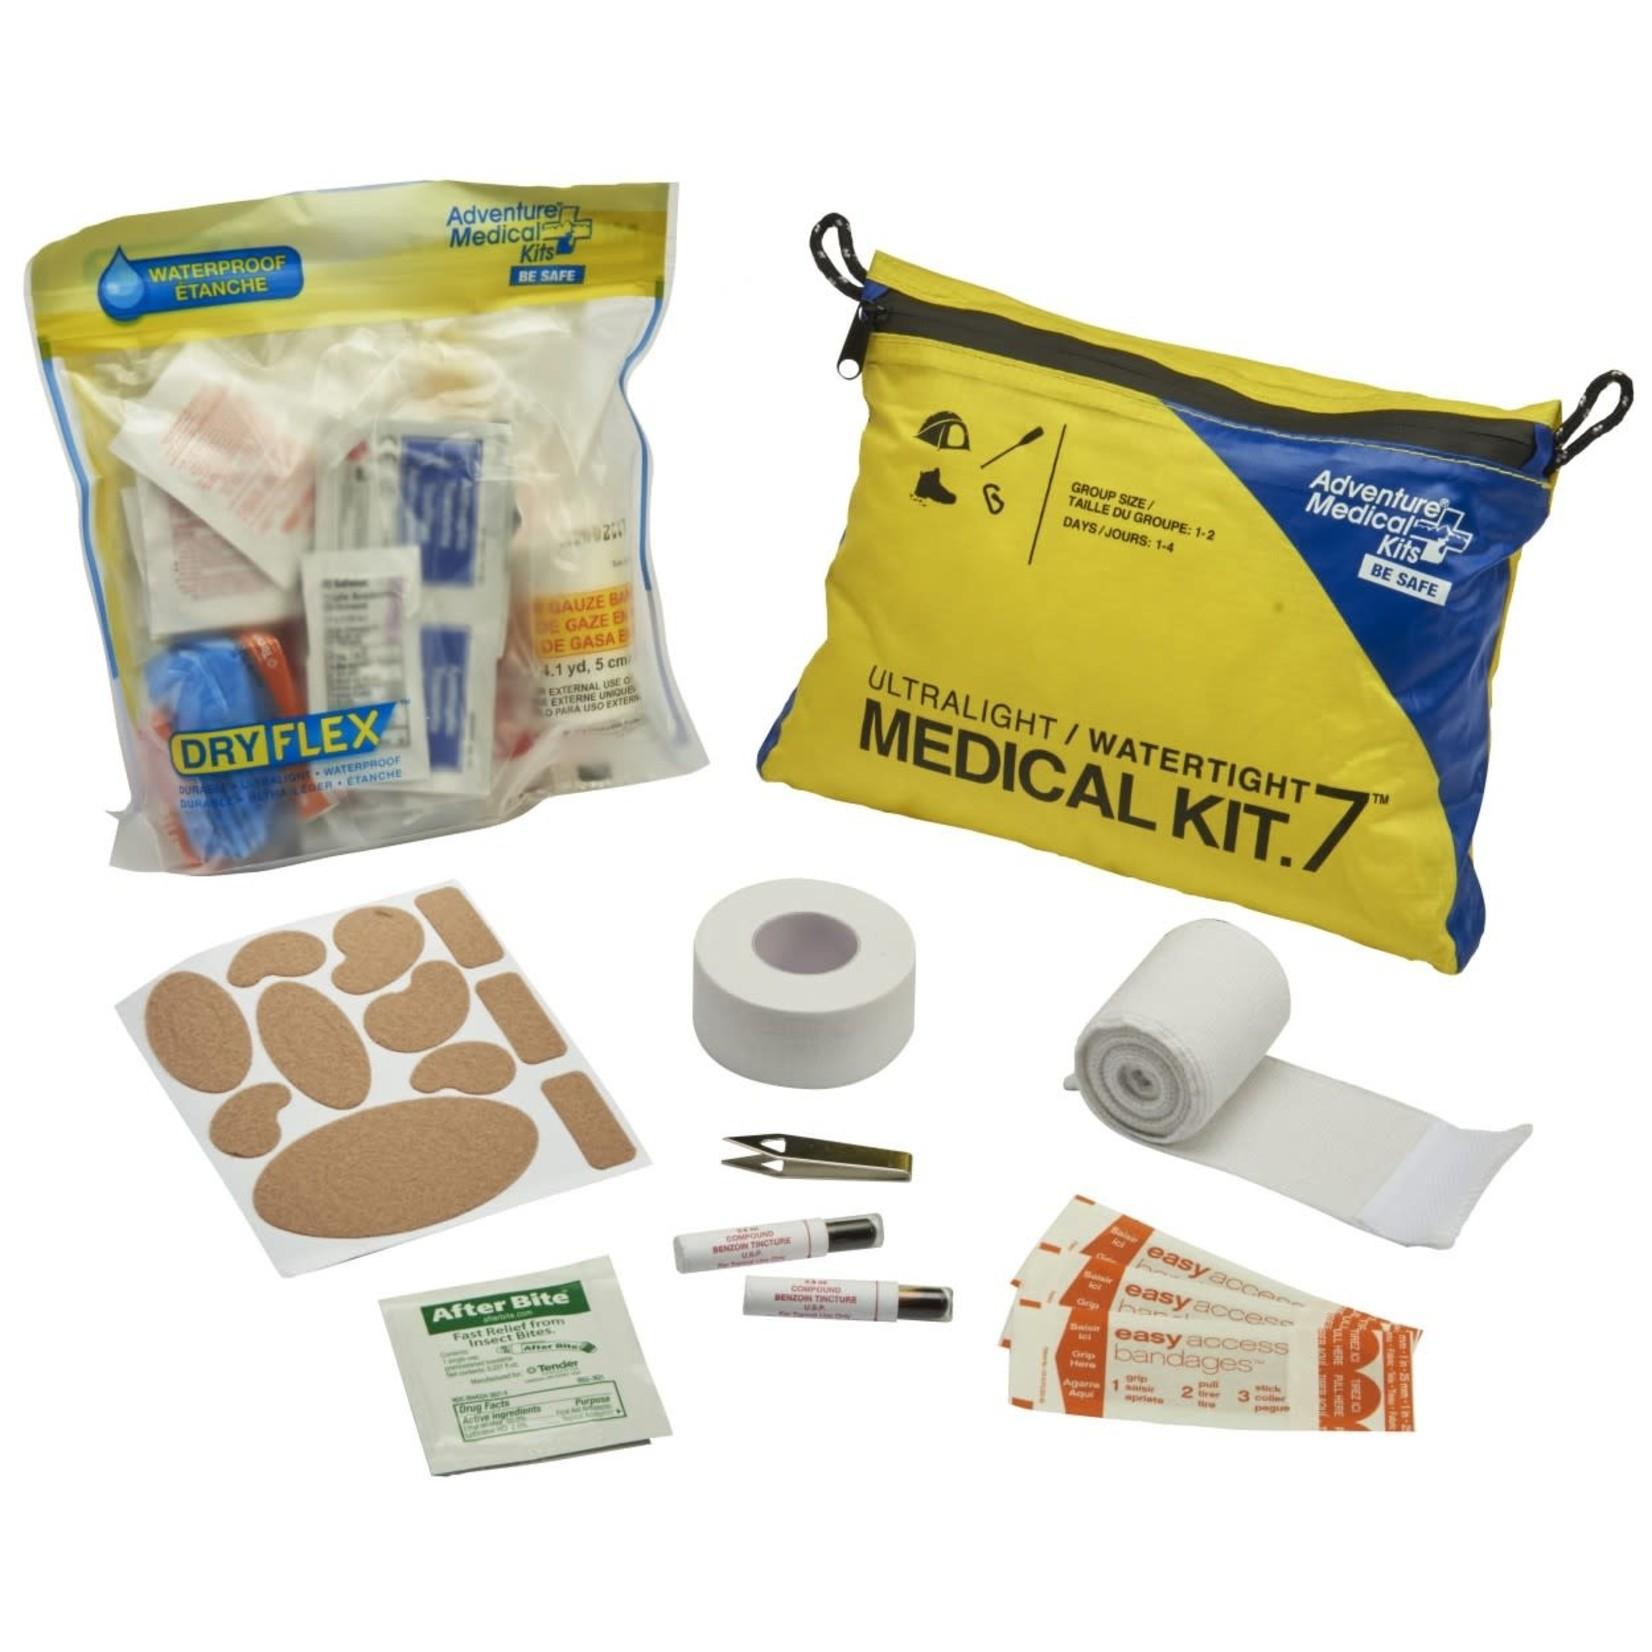 Adventure Medical Kit Trousse Adventure Medical Kit Ultralight - 0.7